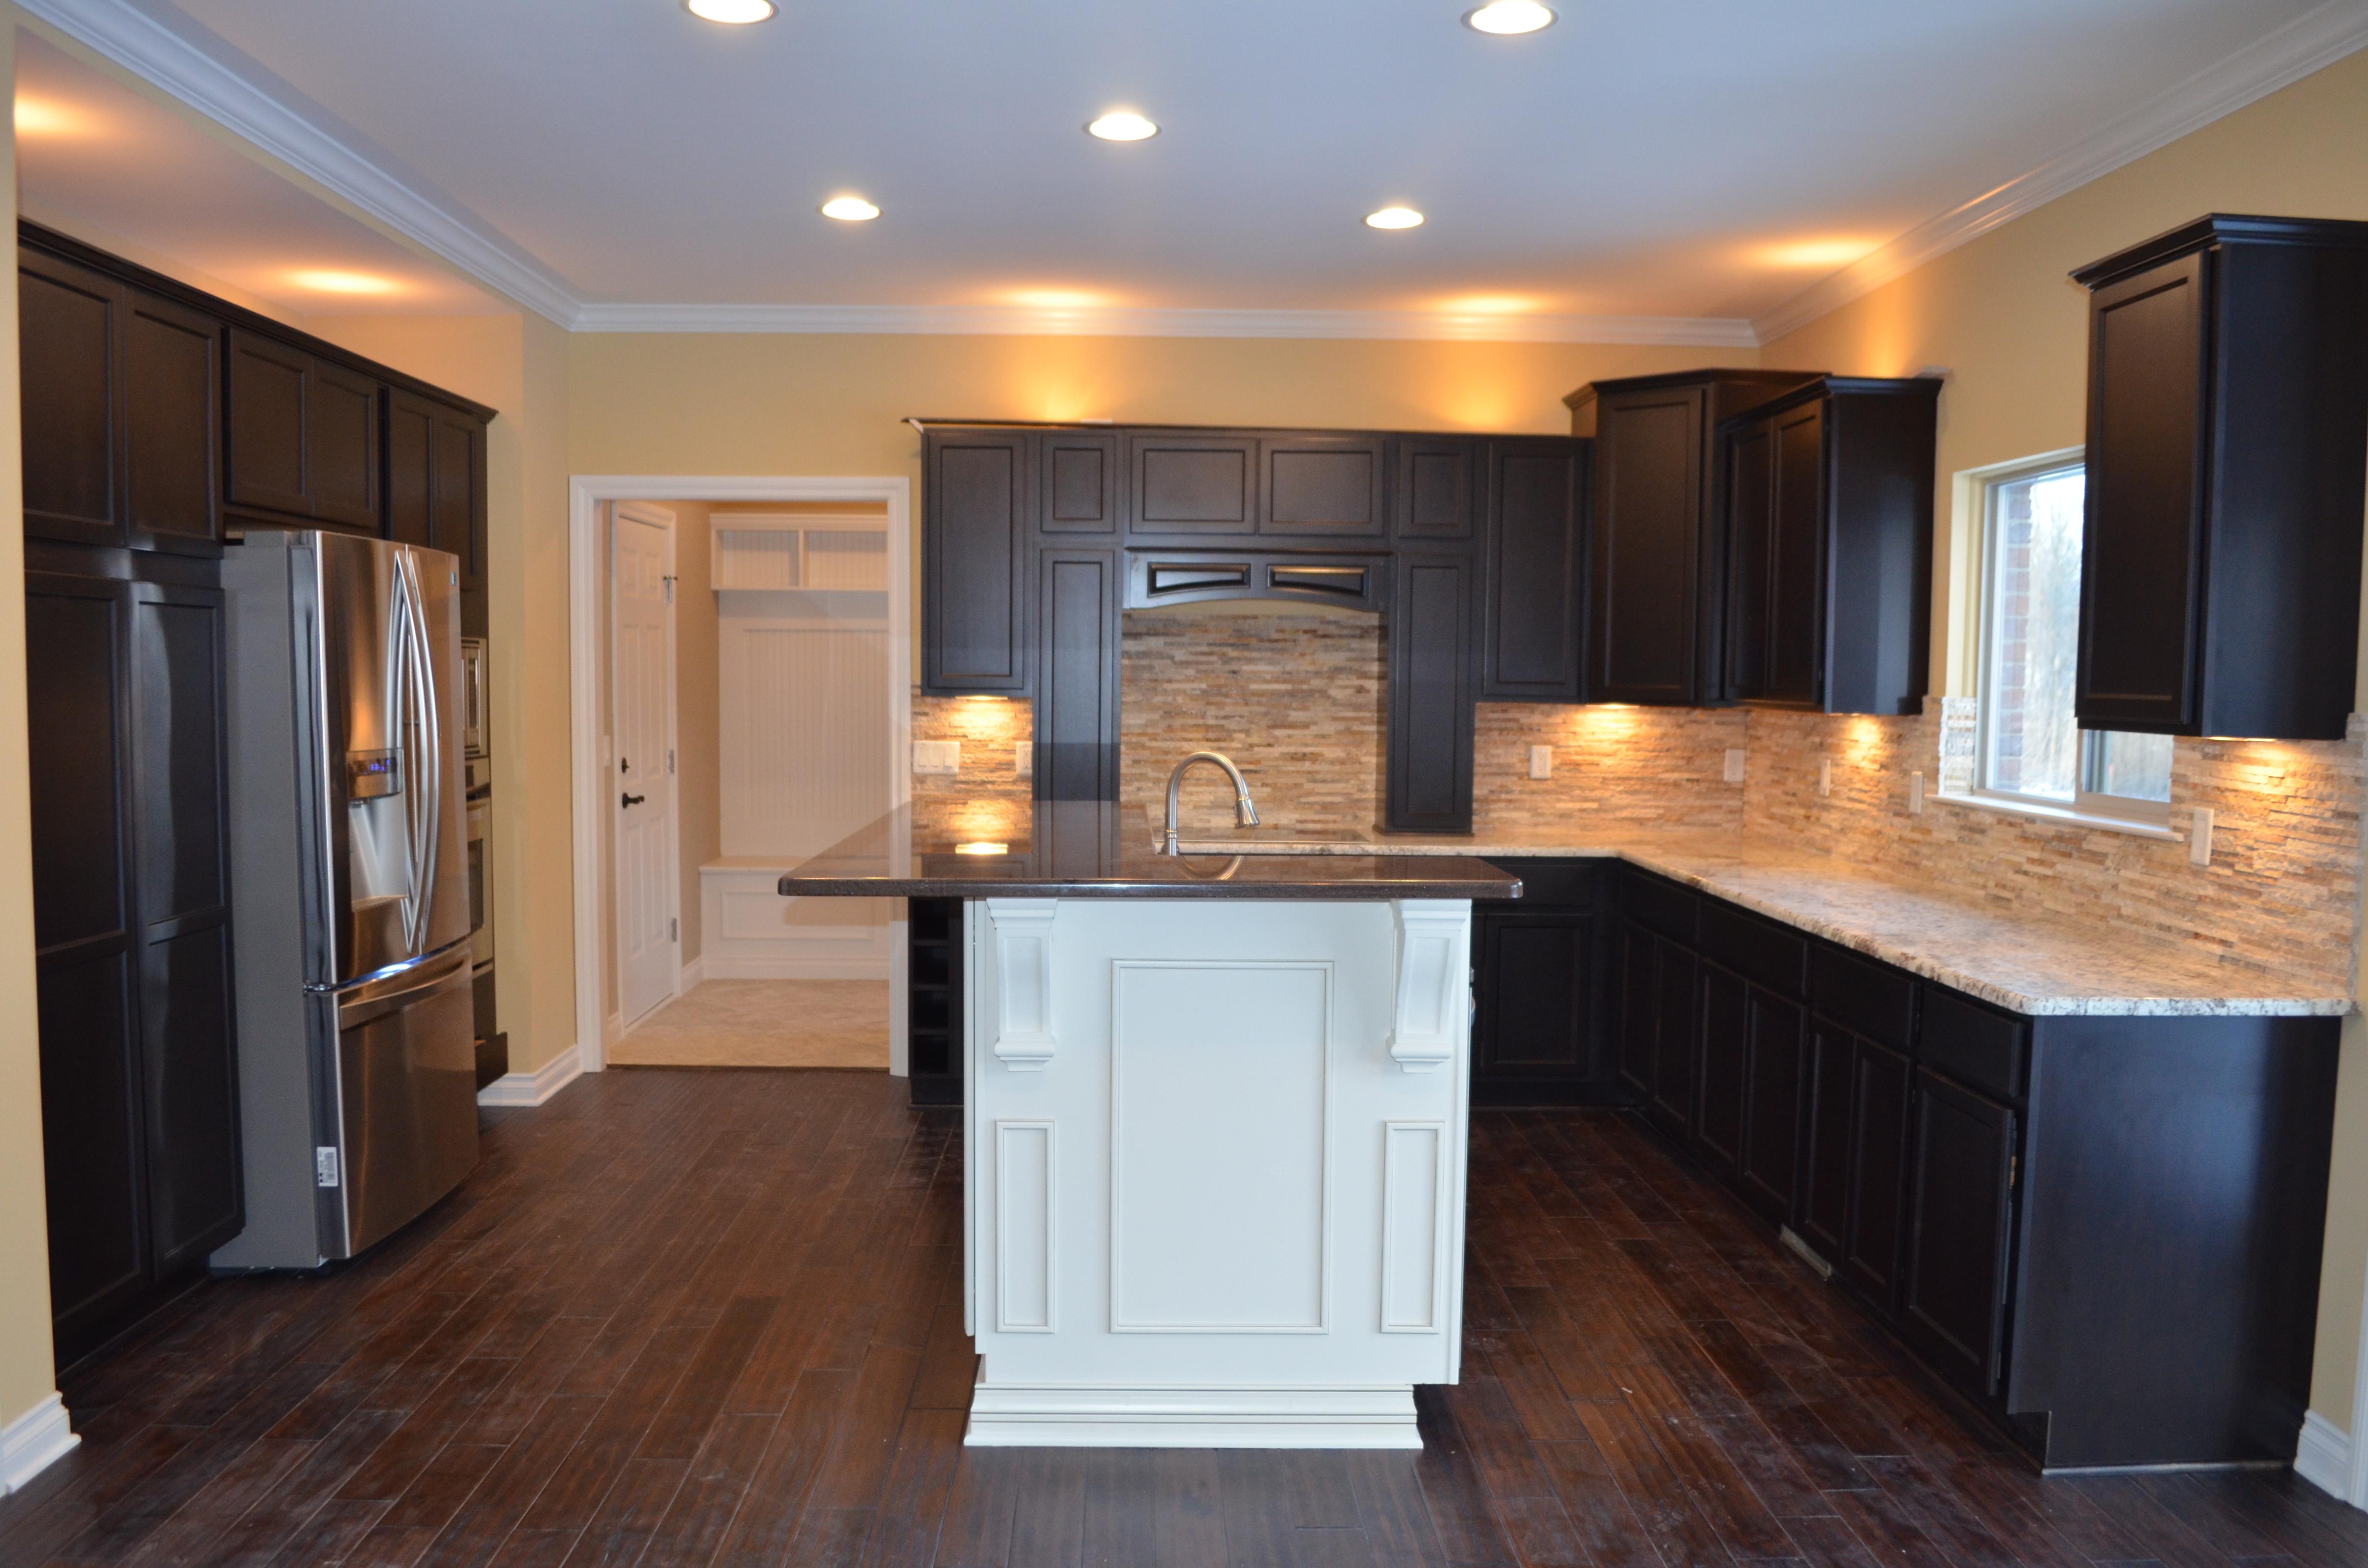 New Homes For Sale, Grand River, KI